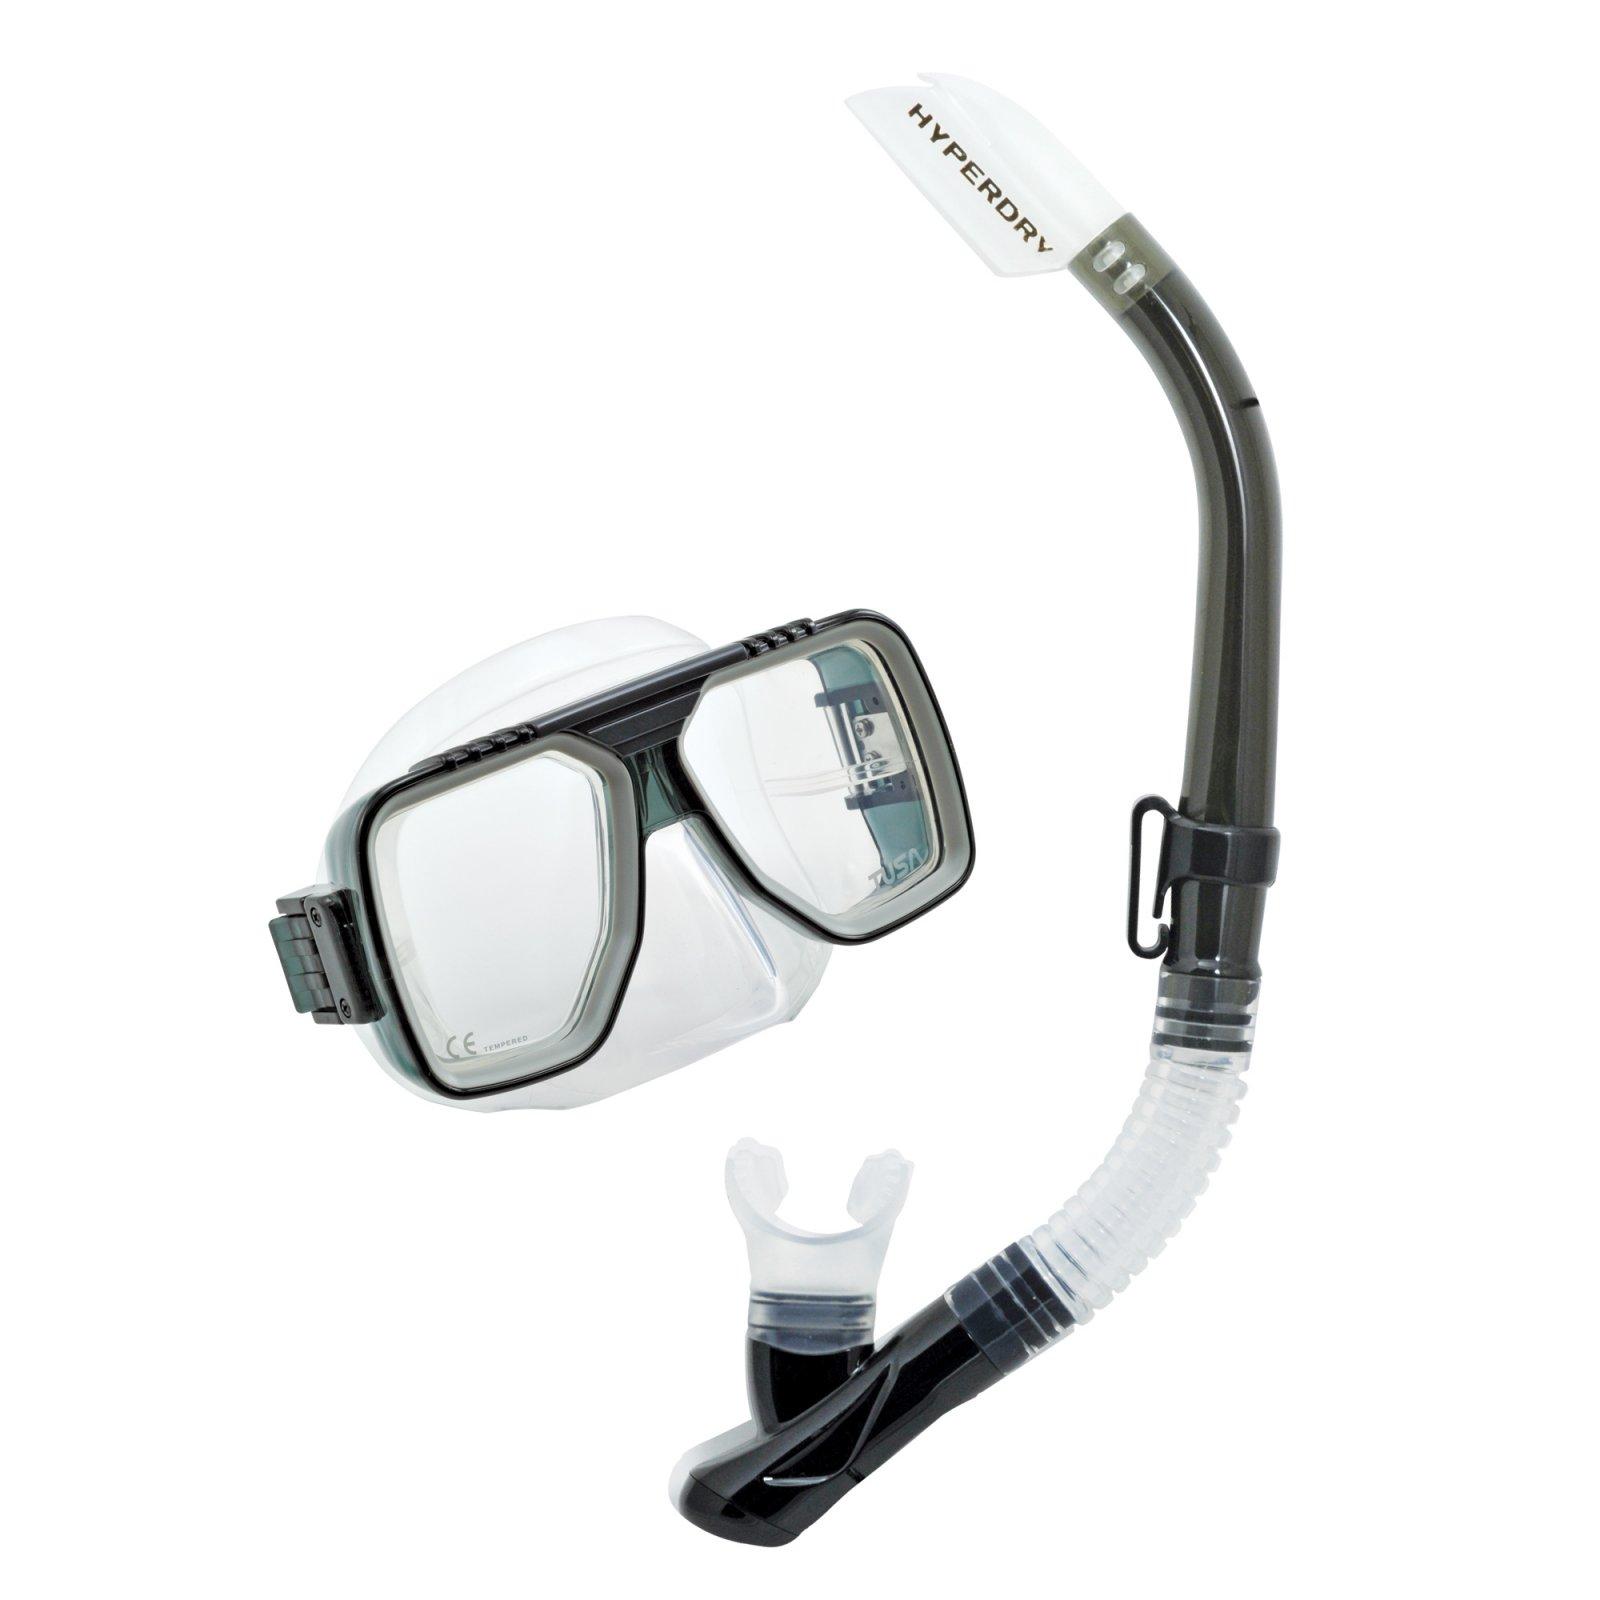 TUSA Liberator Adult Mask & Snorkel Set